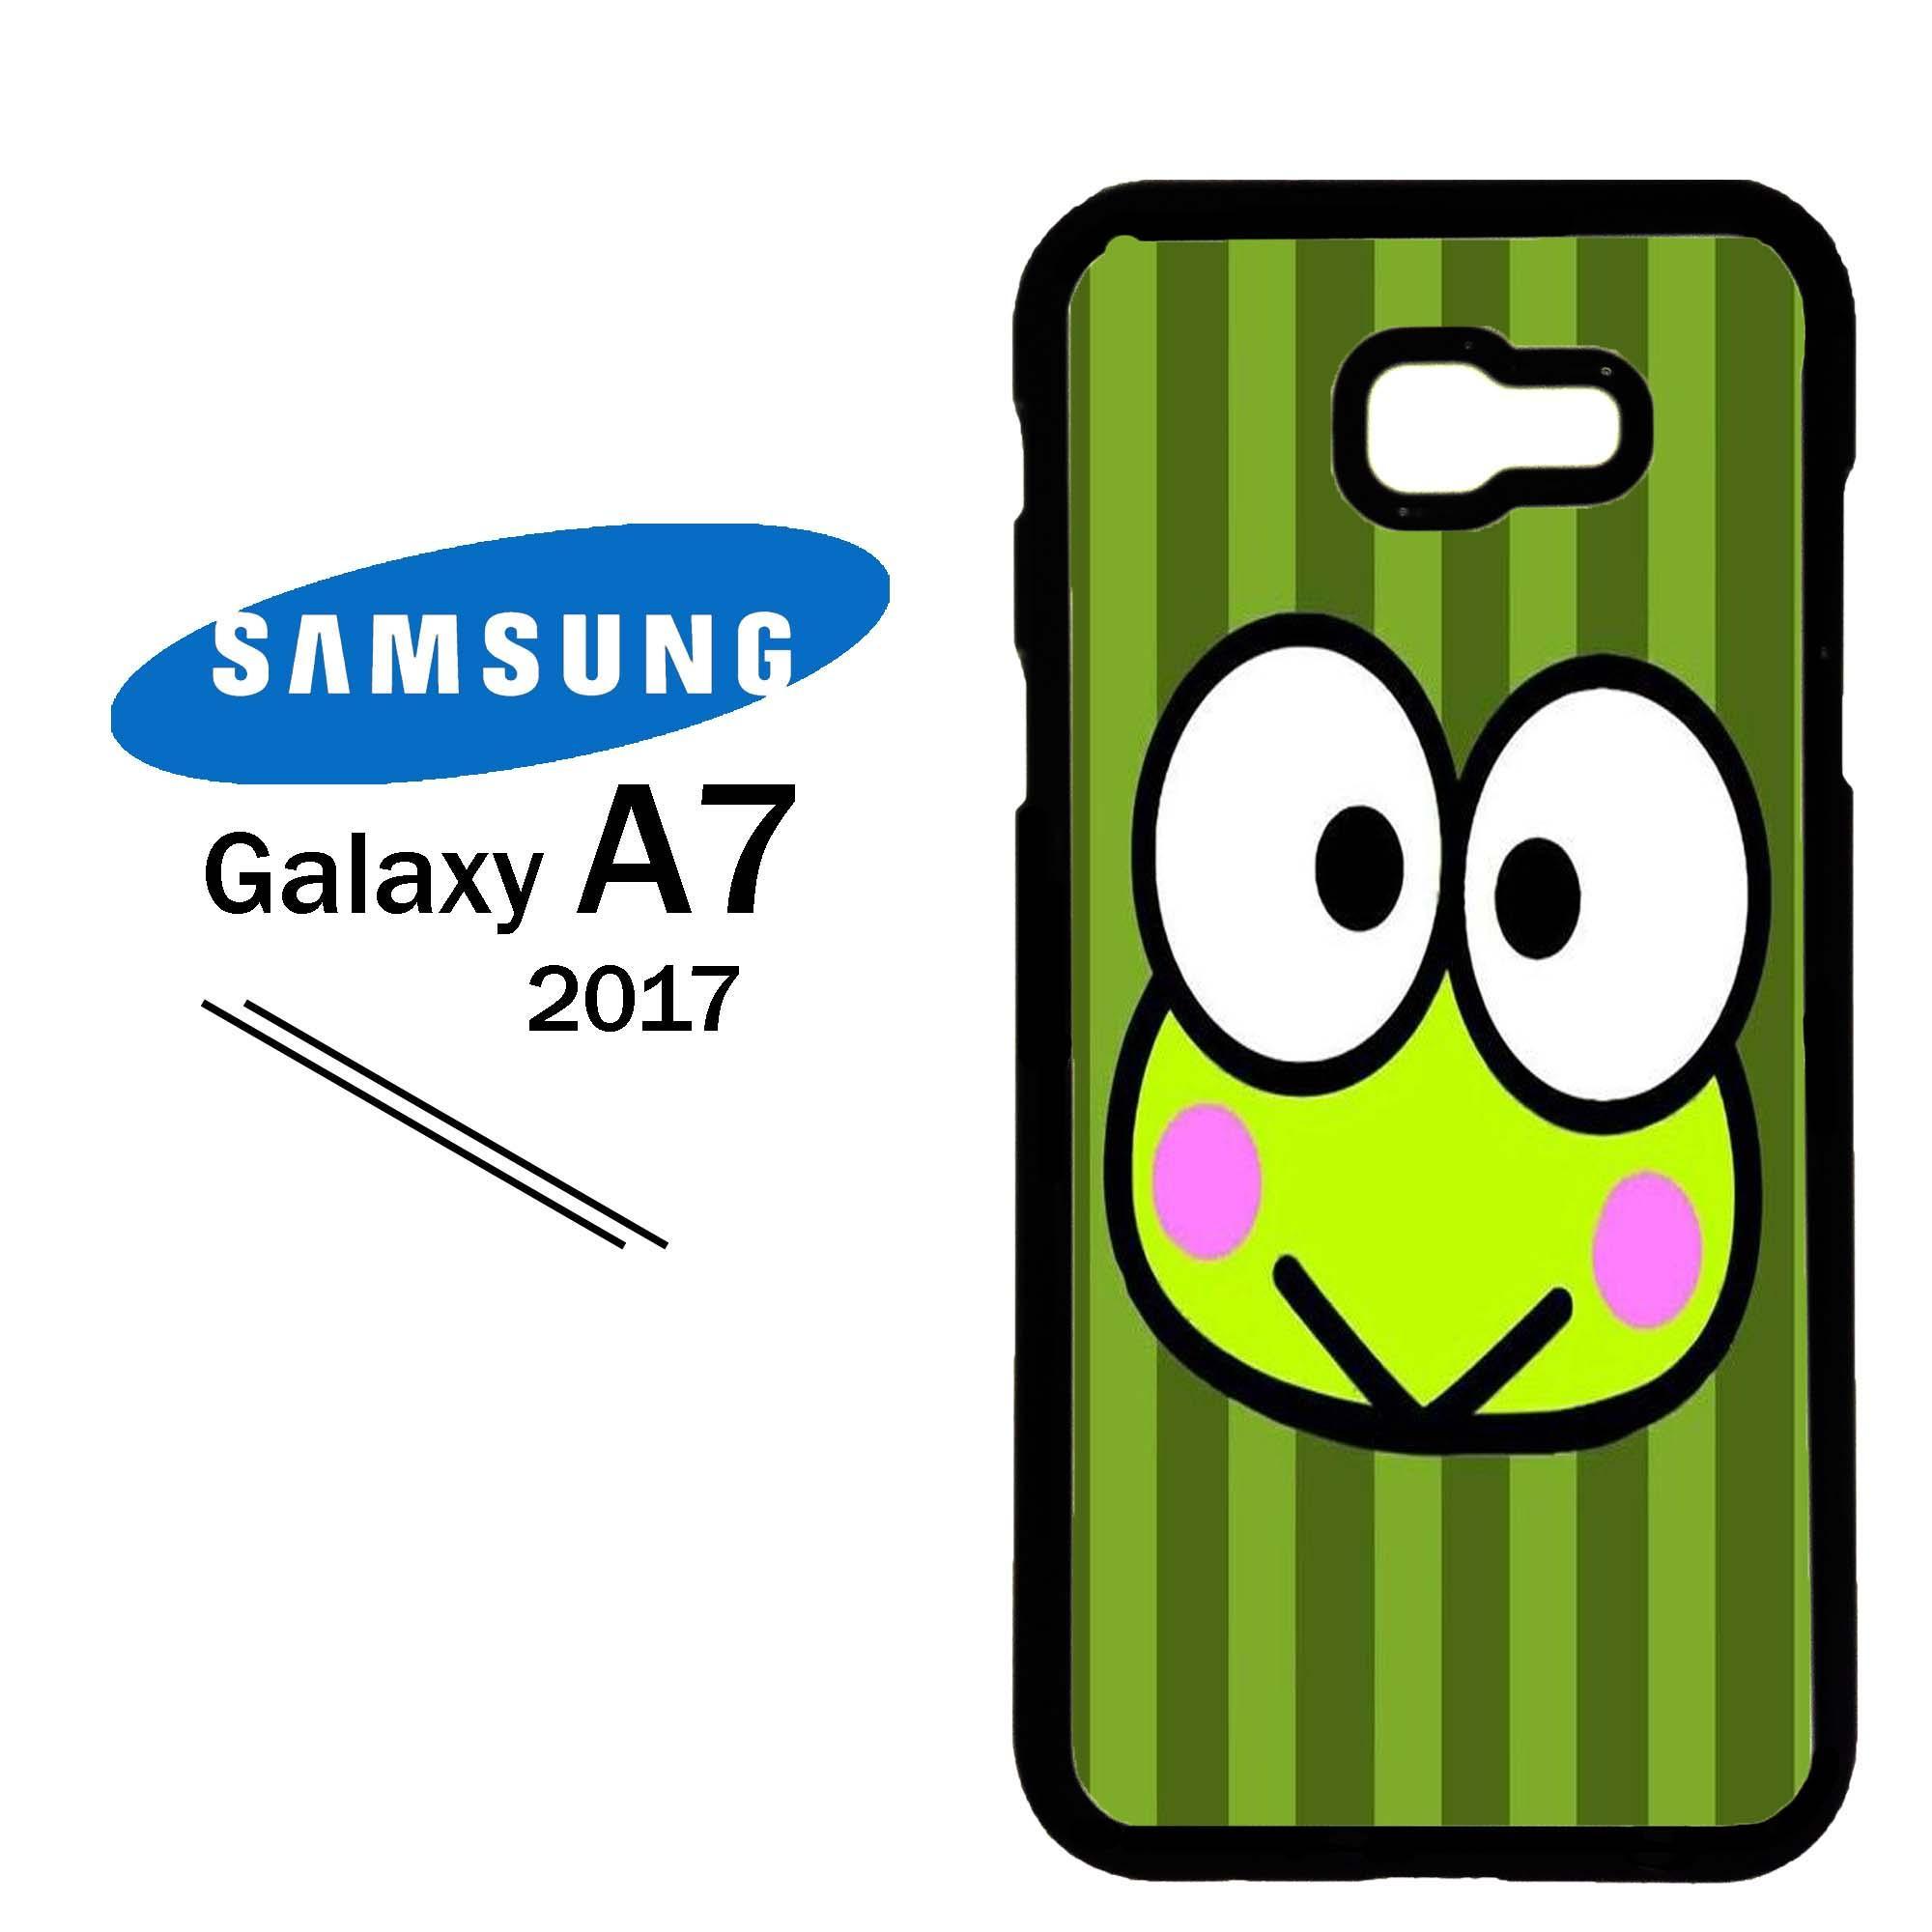 Buy Sell Cheapest Samsung 18 5 Best Quality Product Deals J1 Mini Garansi Resmi Rajamurah Fasion Printing Case A7 2017